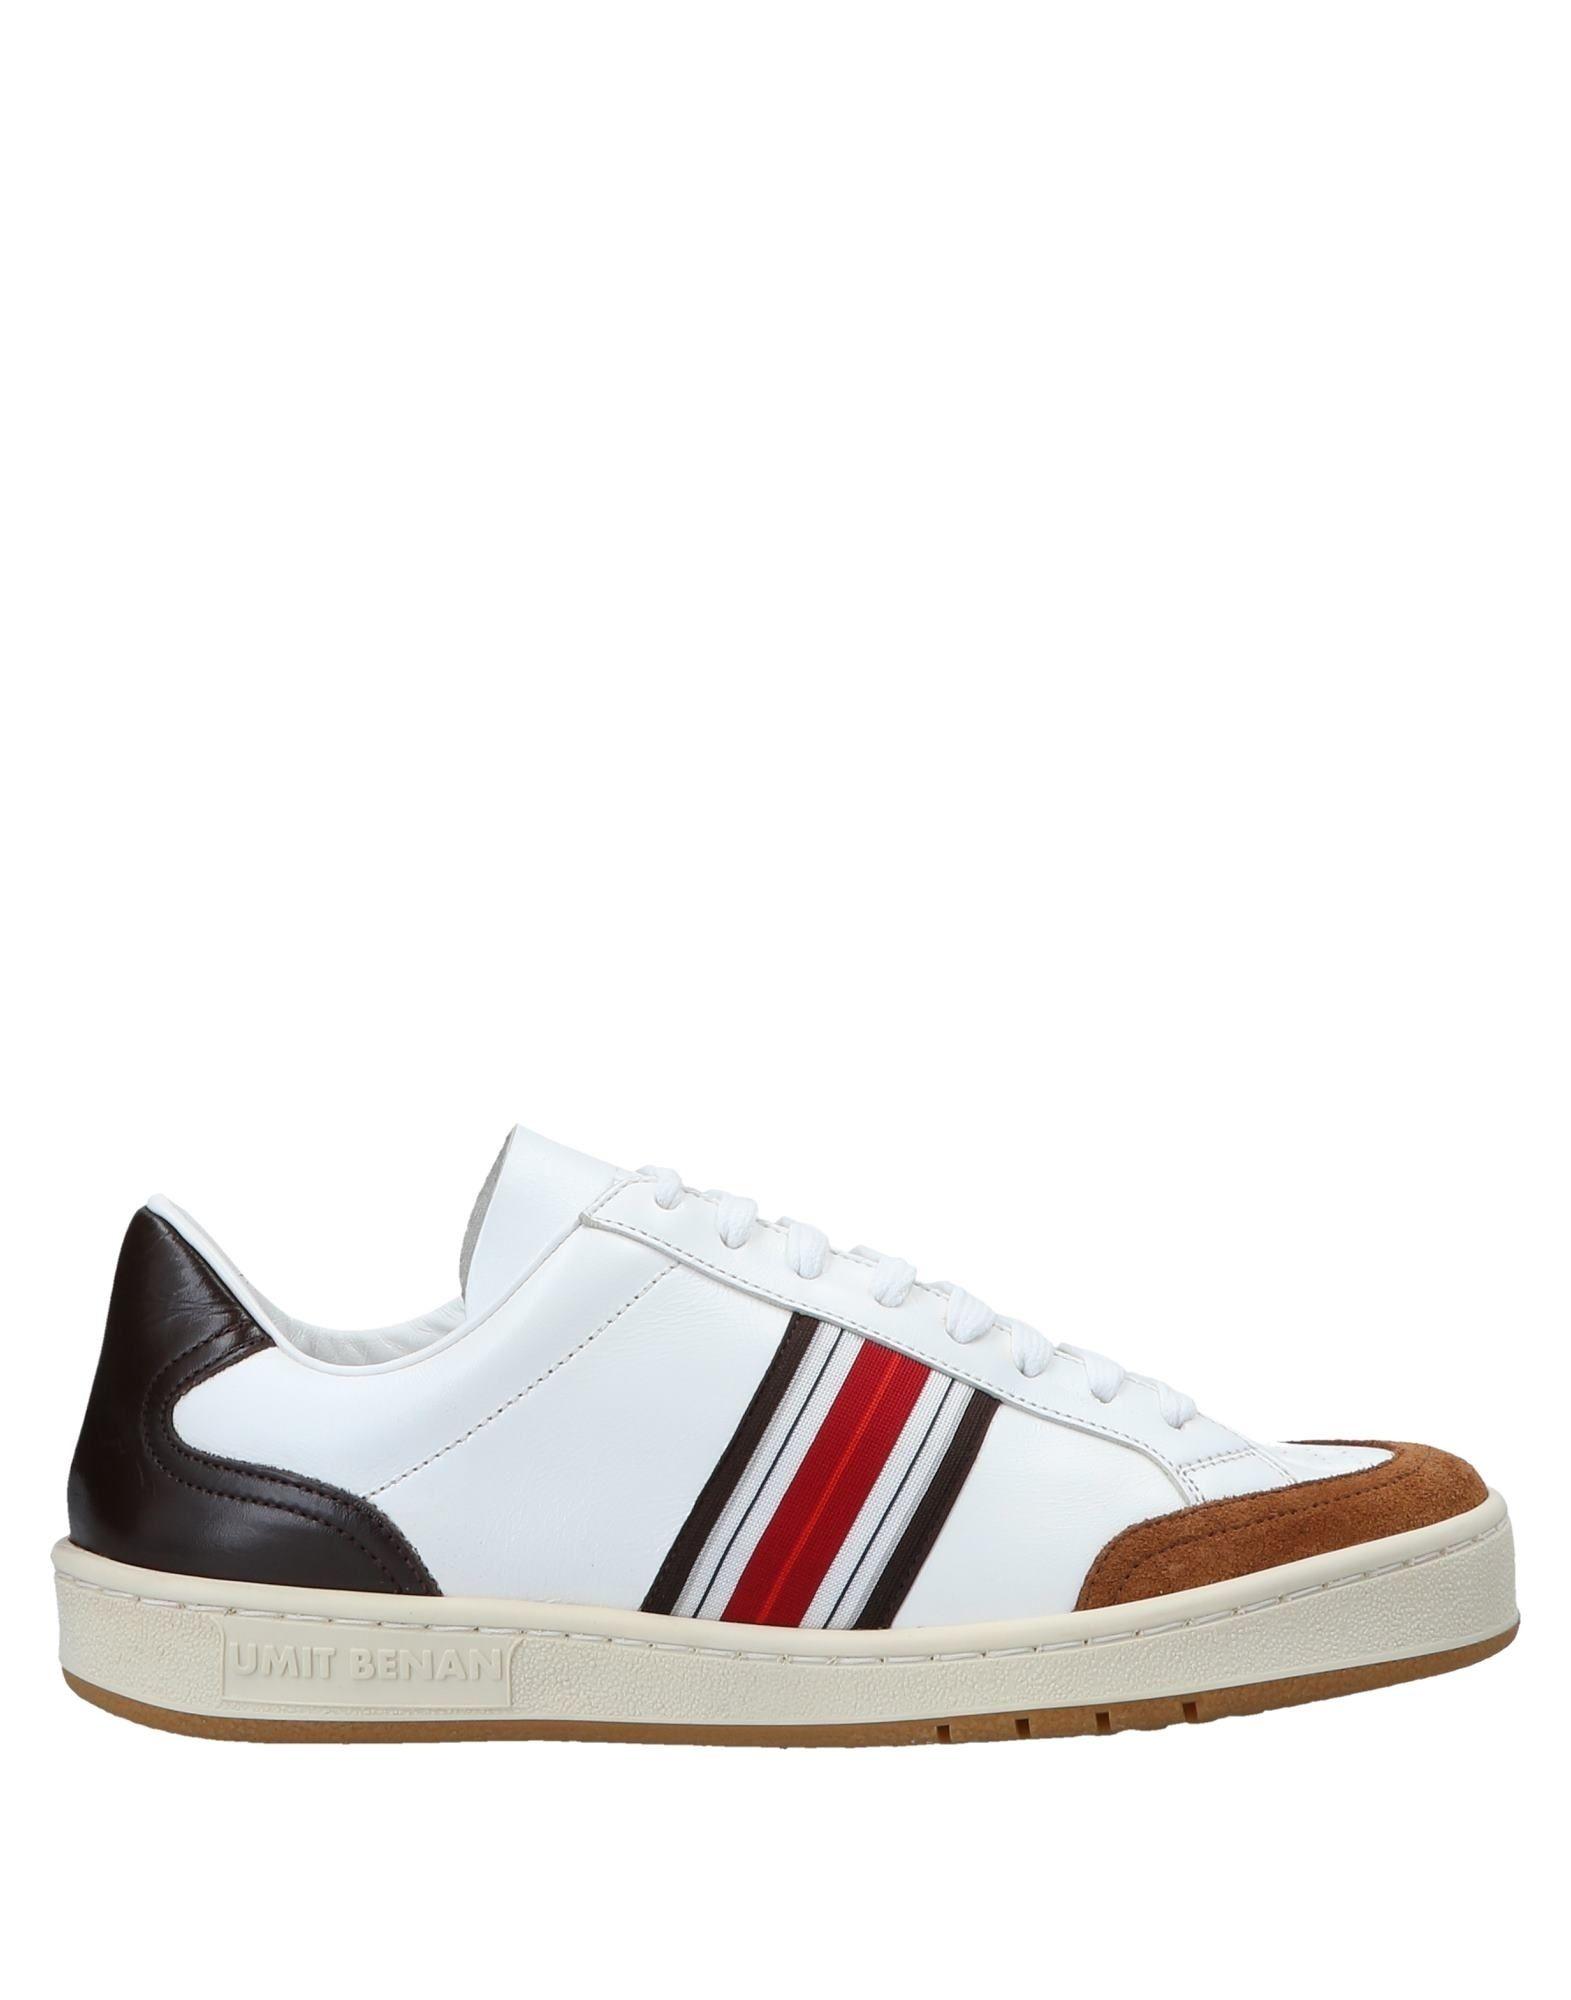 Umit Benan Sneakers Herren  11548735DV Gute Qualität beliebte Schuhe